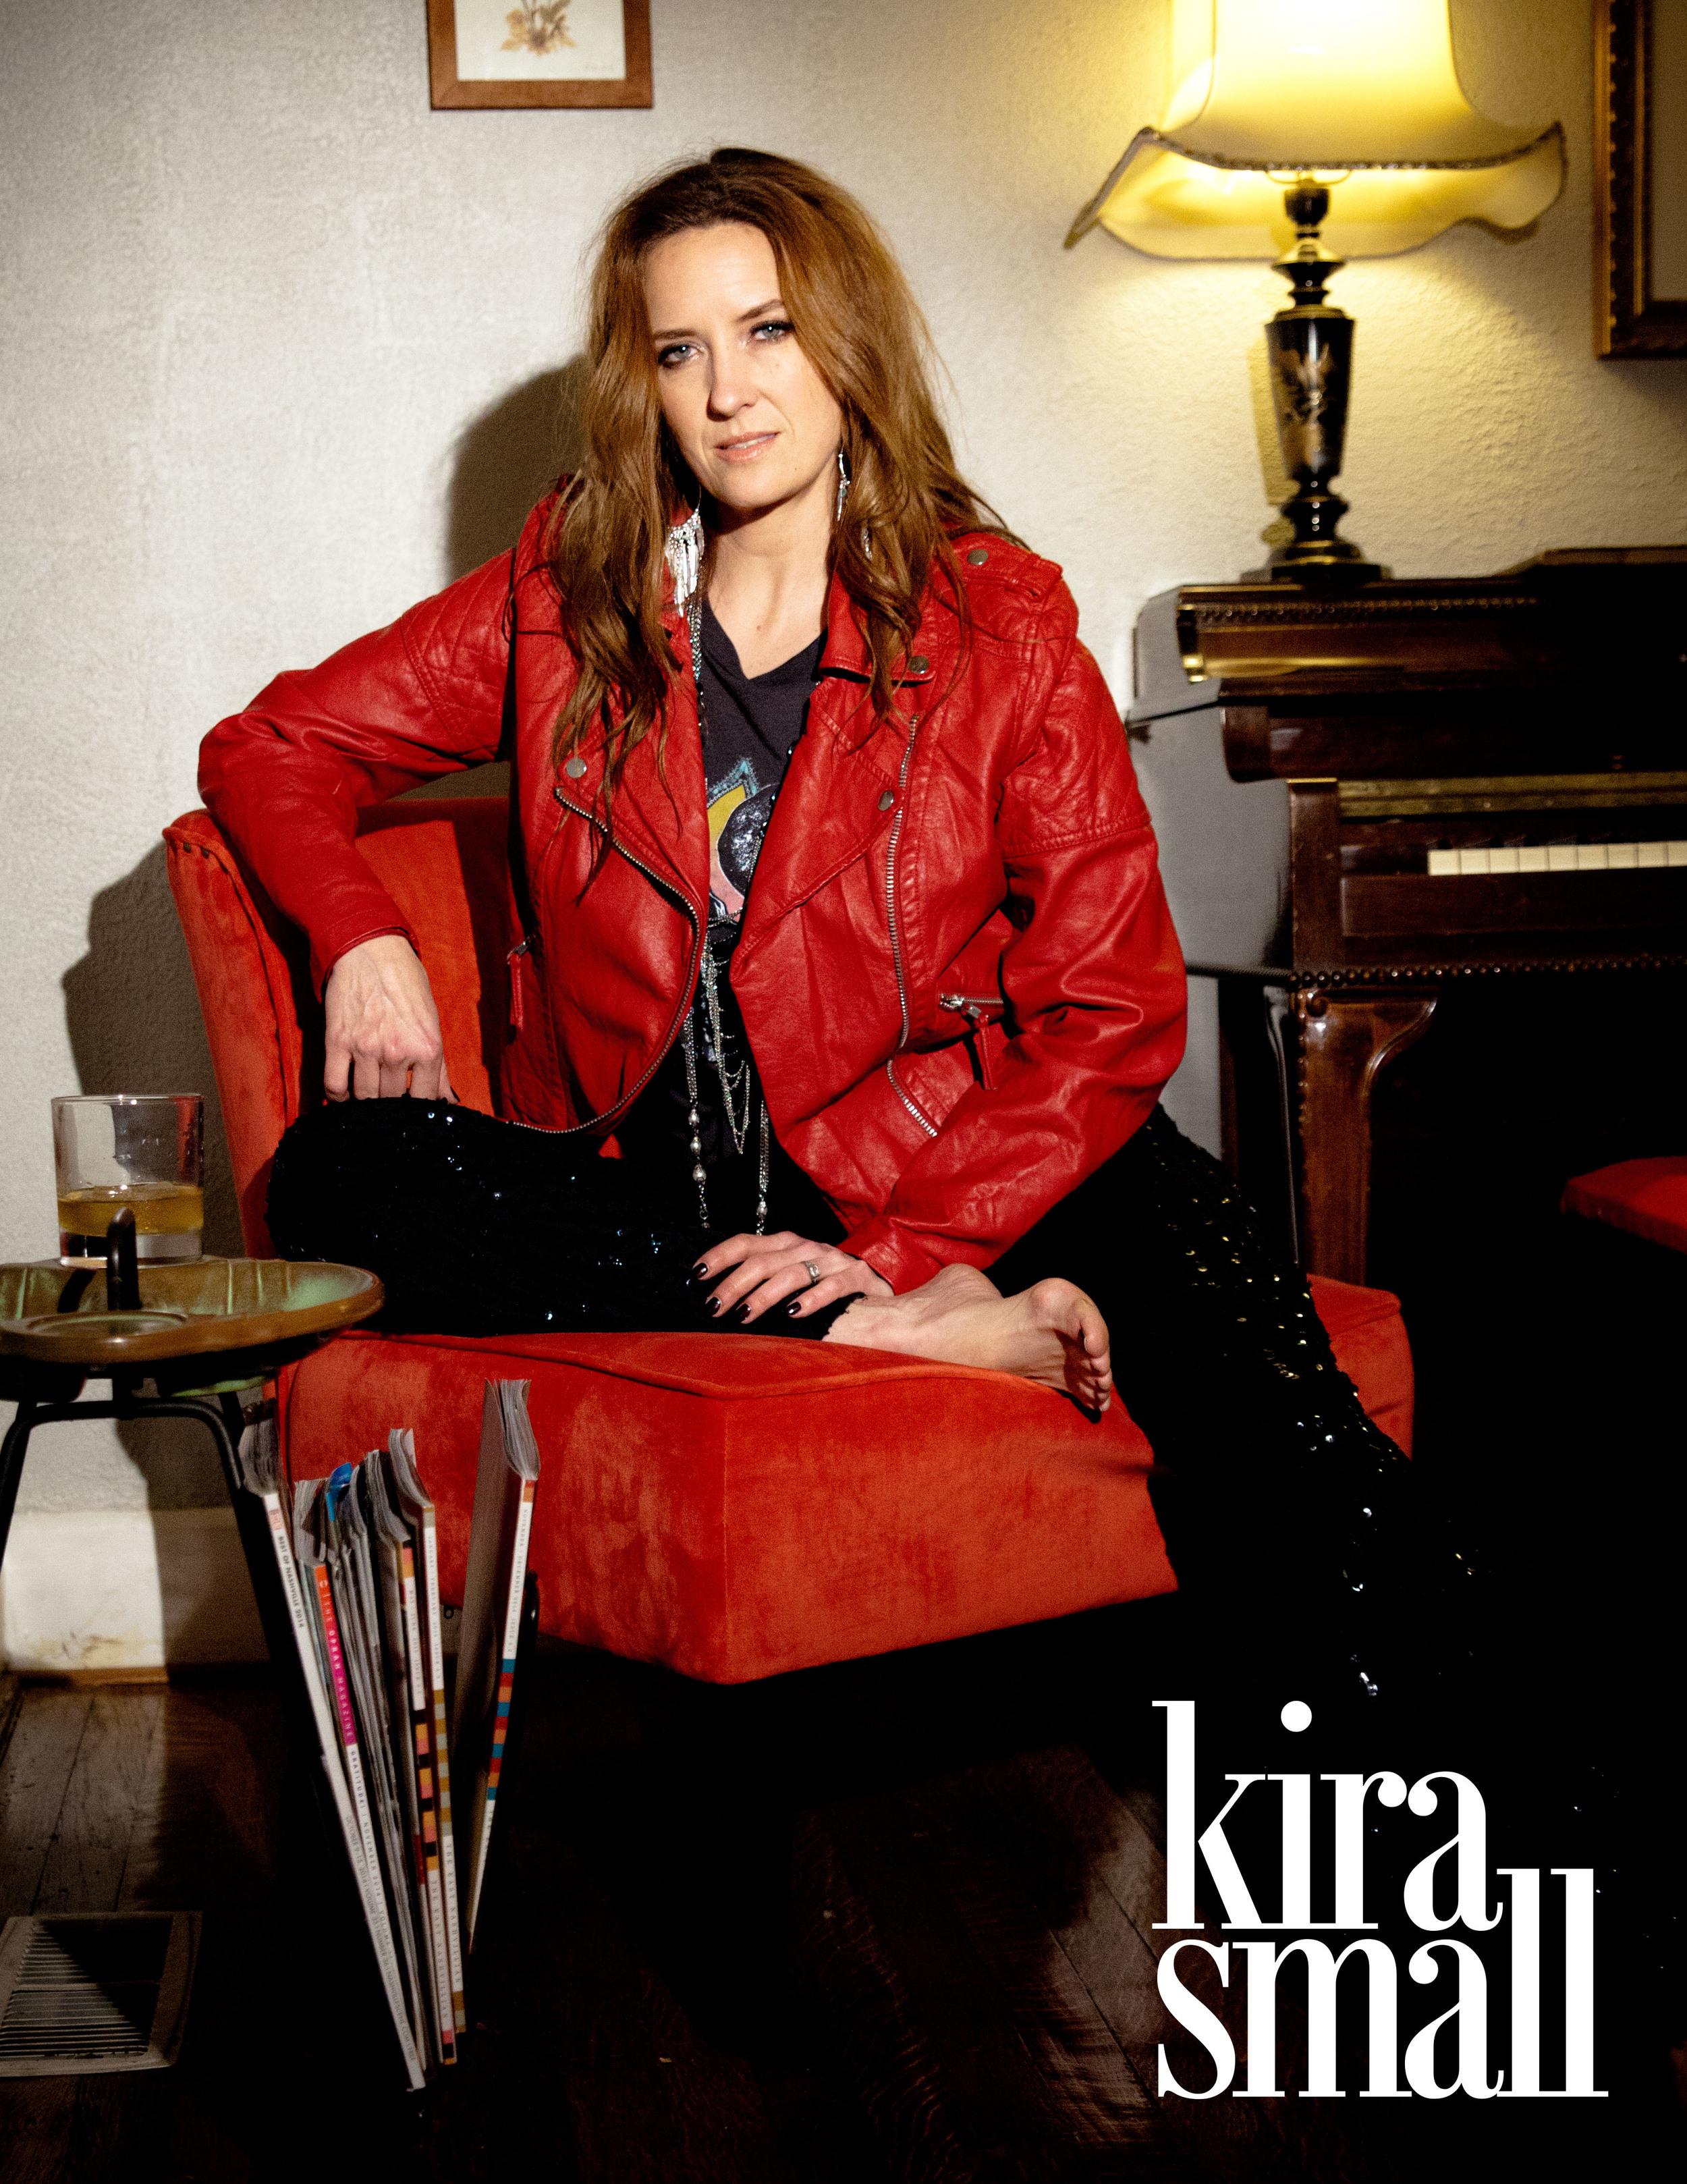 Kira-Small-Red-Jacket-Portrait-High-Rez-Logo-3140x4064.jpg